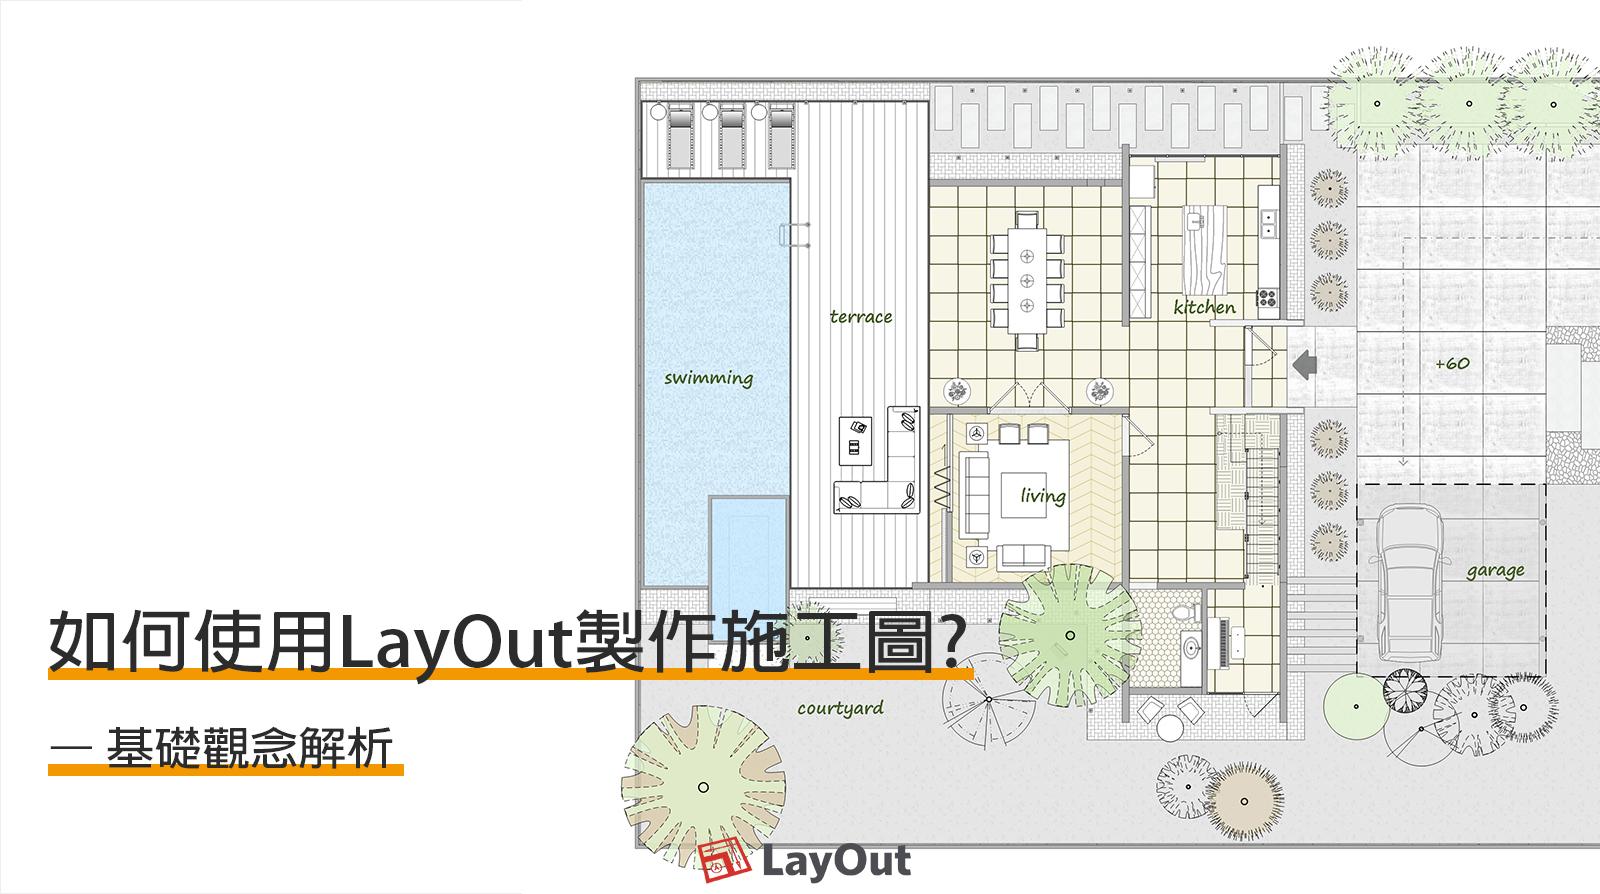 如何使用layout做施工圖